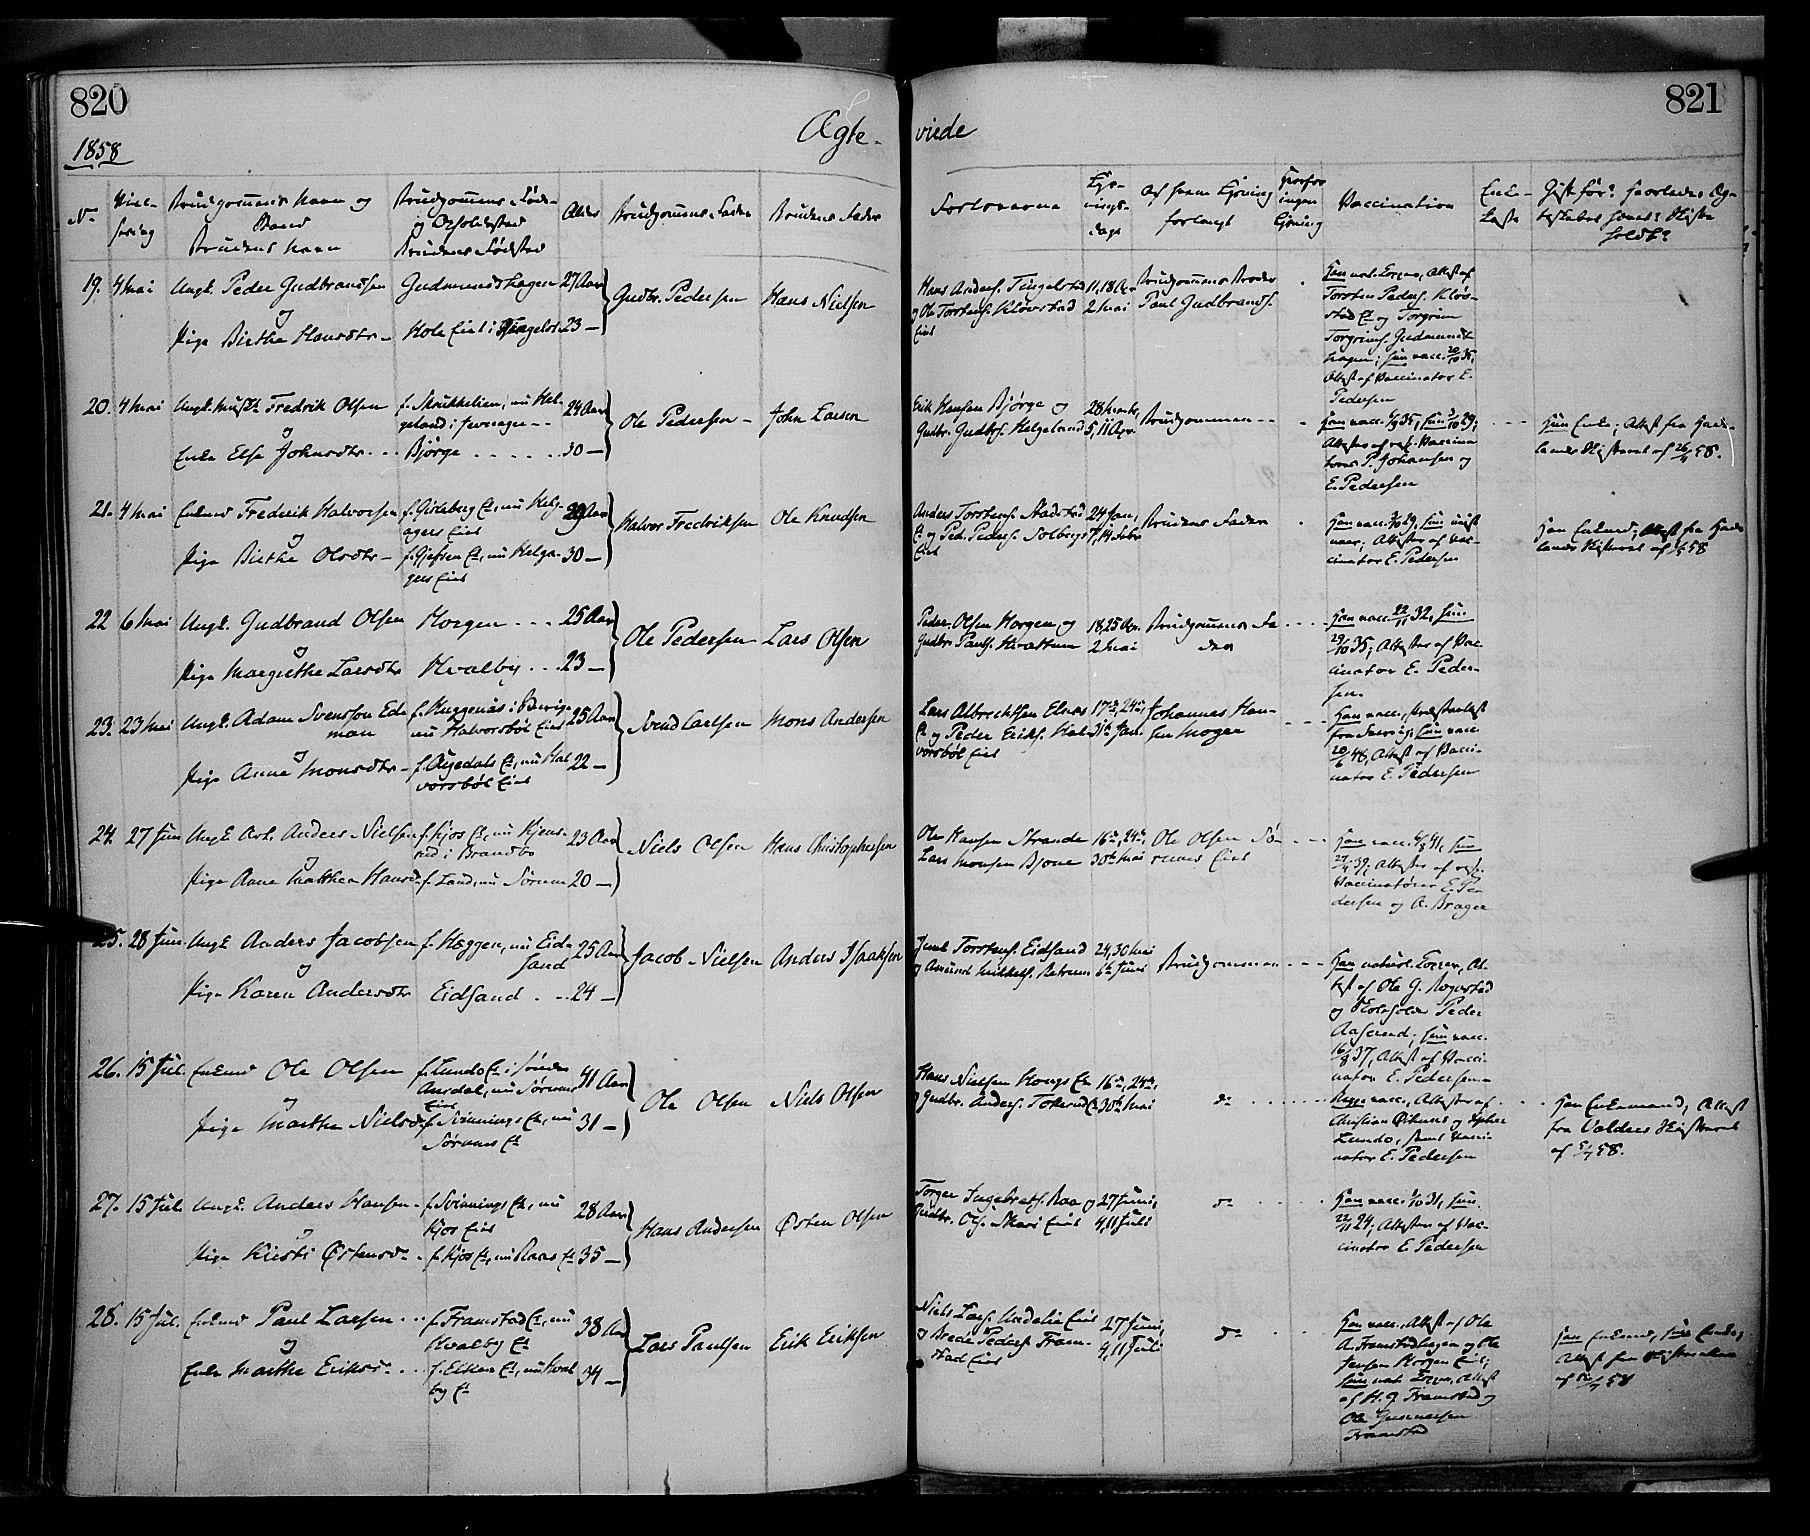 SAH, Gran prestekontor, Ministerialbok nr. 12, 1856-1874, s. 820-821